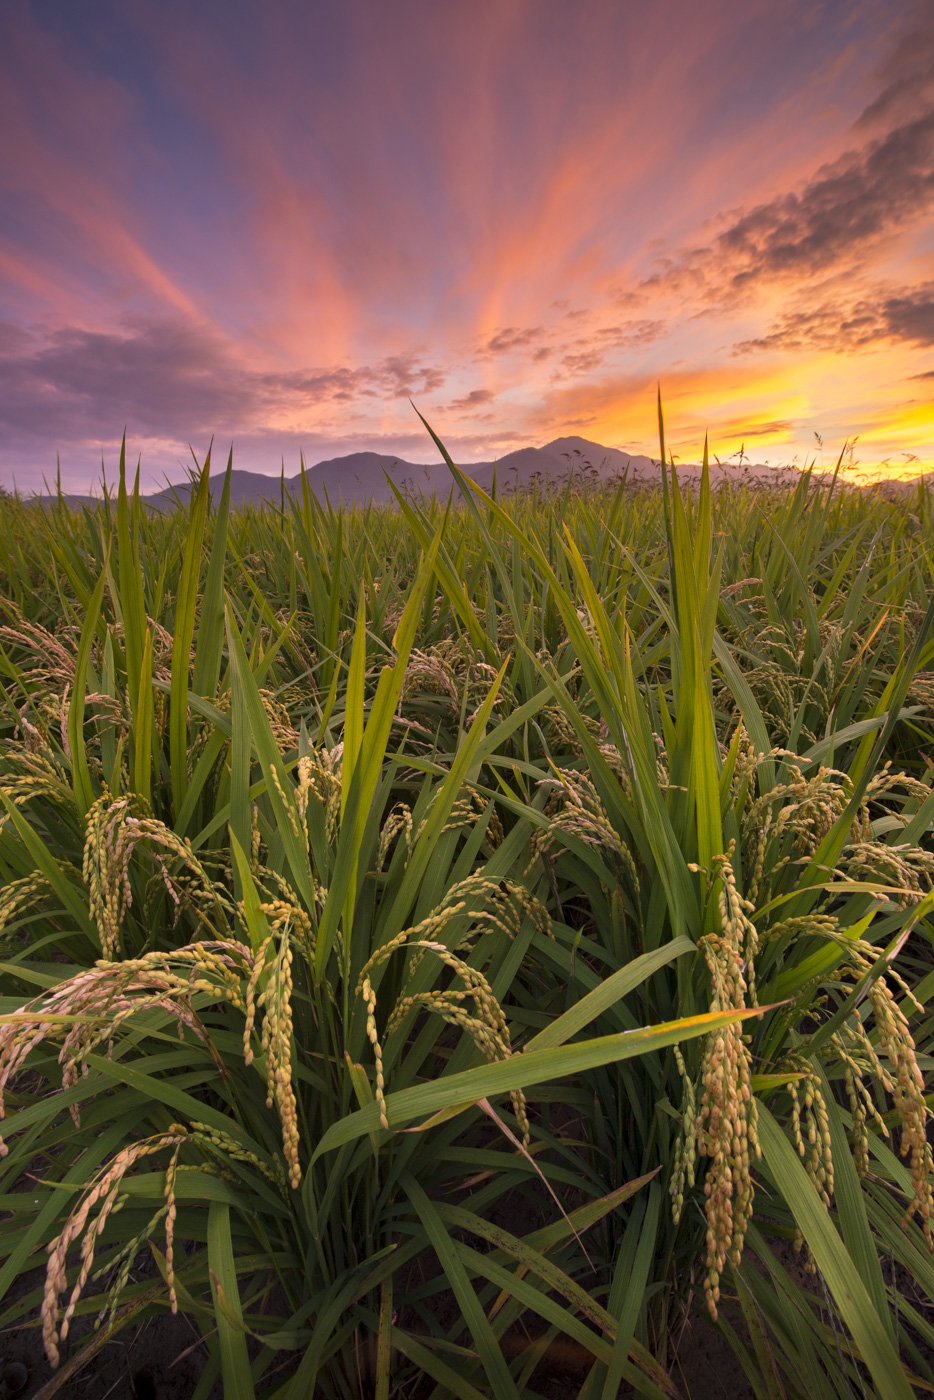 ricefieldsunset.jpg